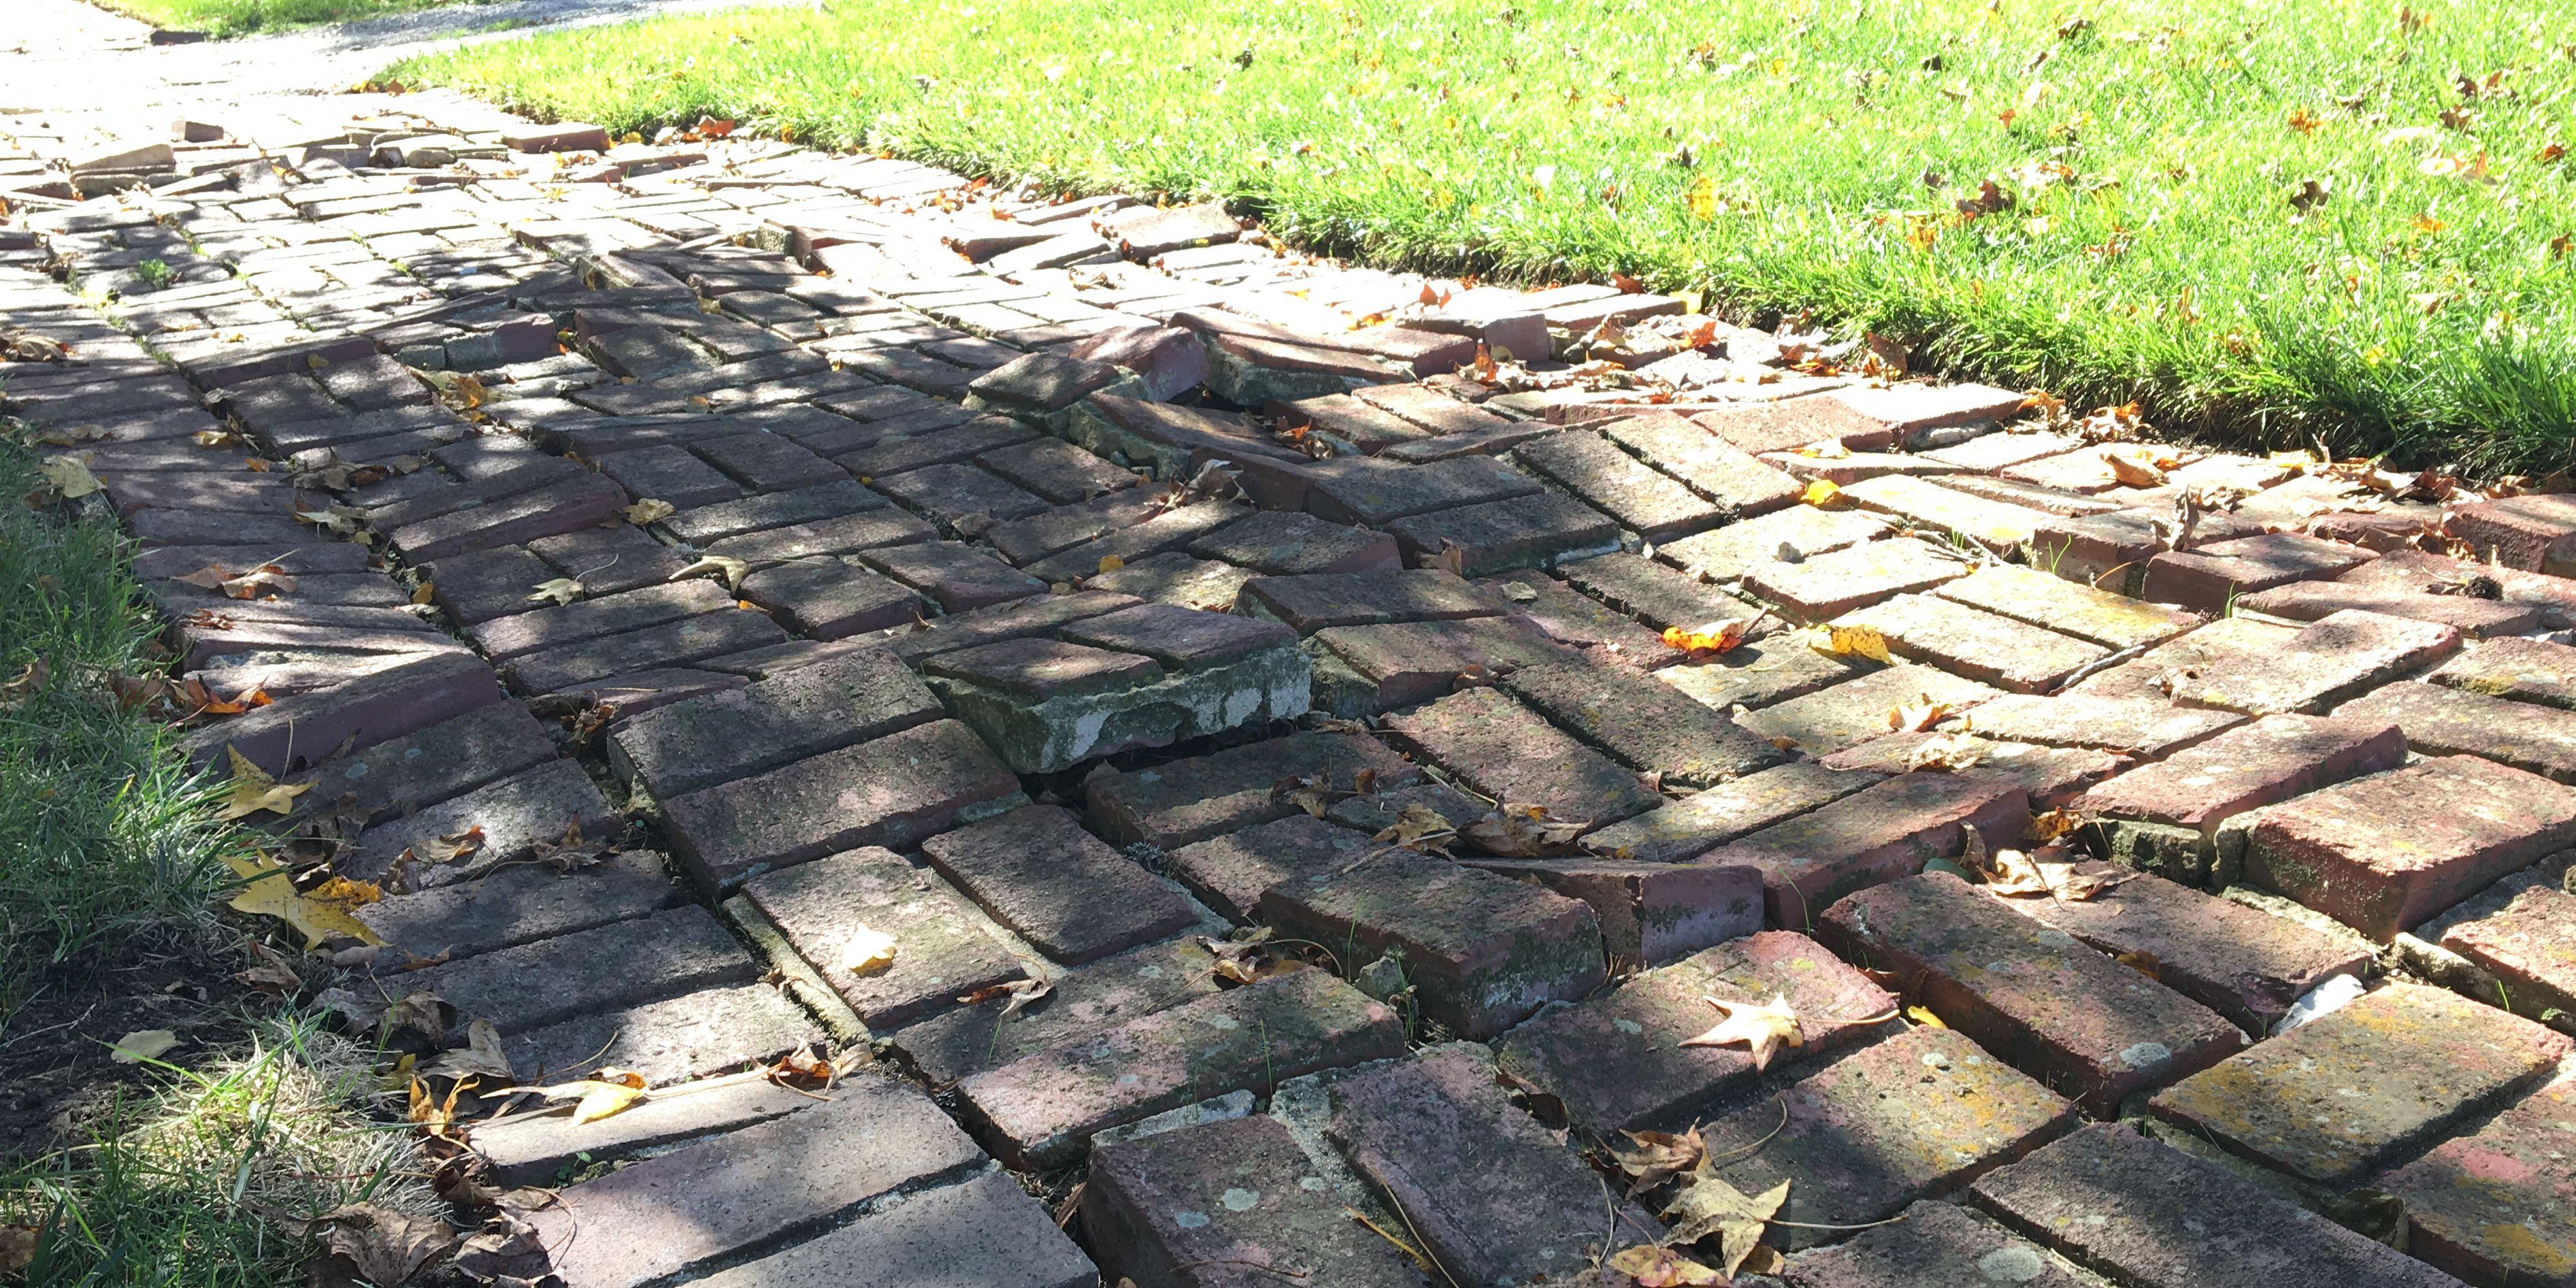 Buckling brick sidewalks raise concerns in historic neighborhood